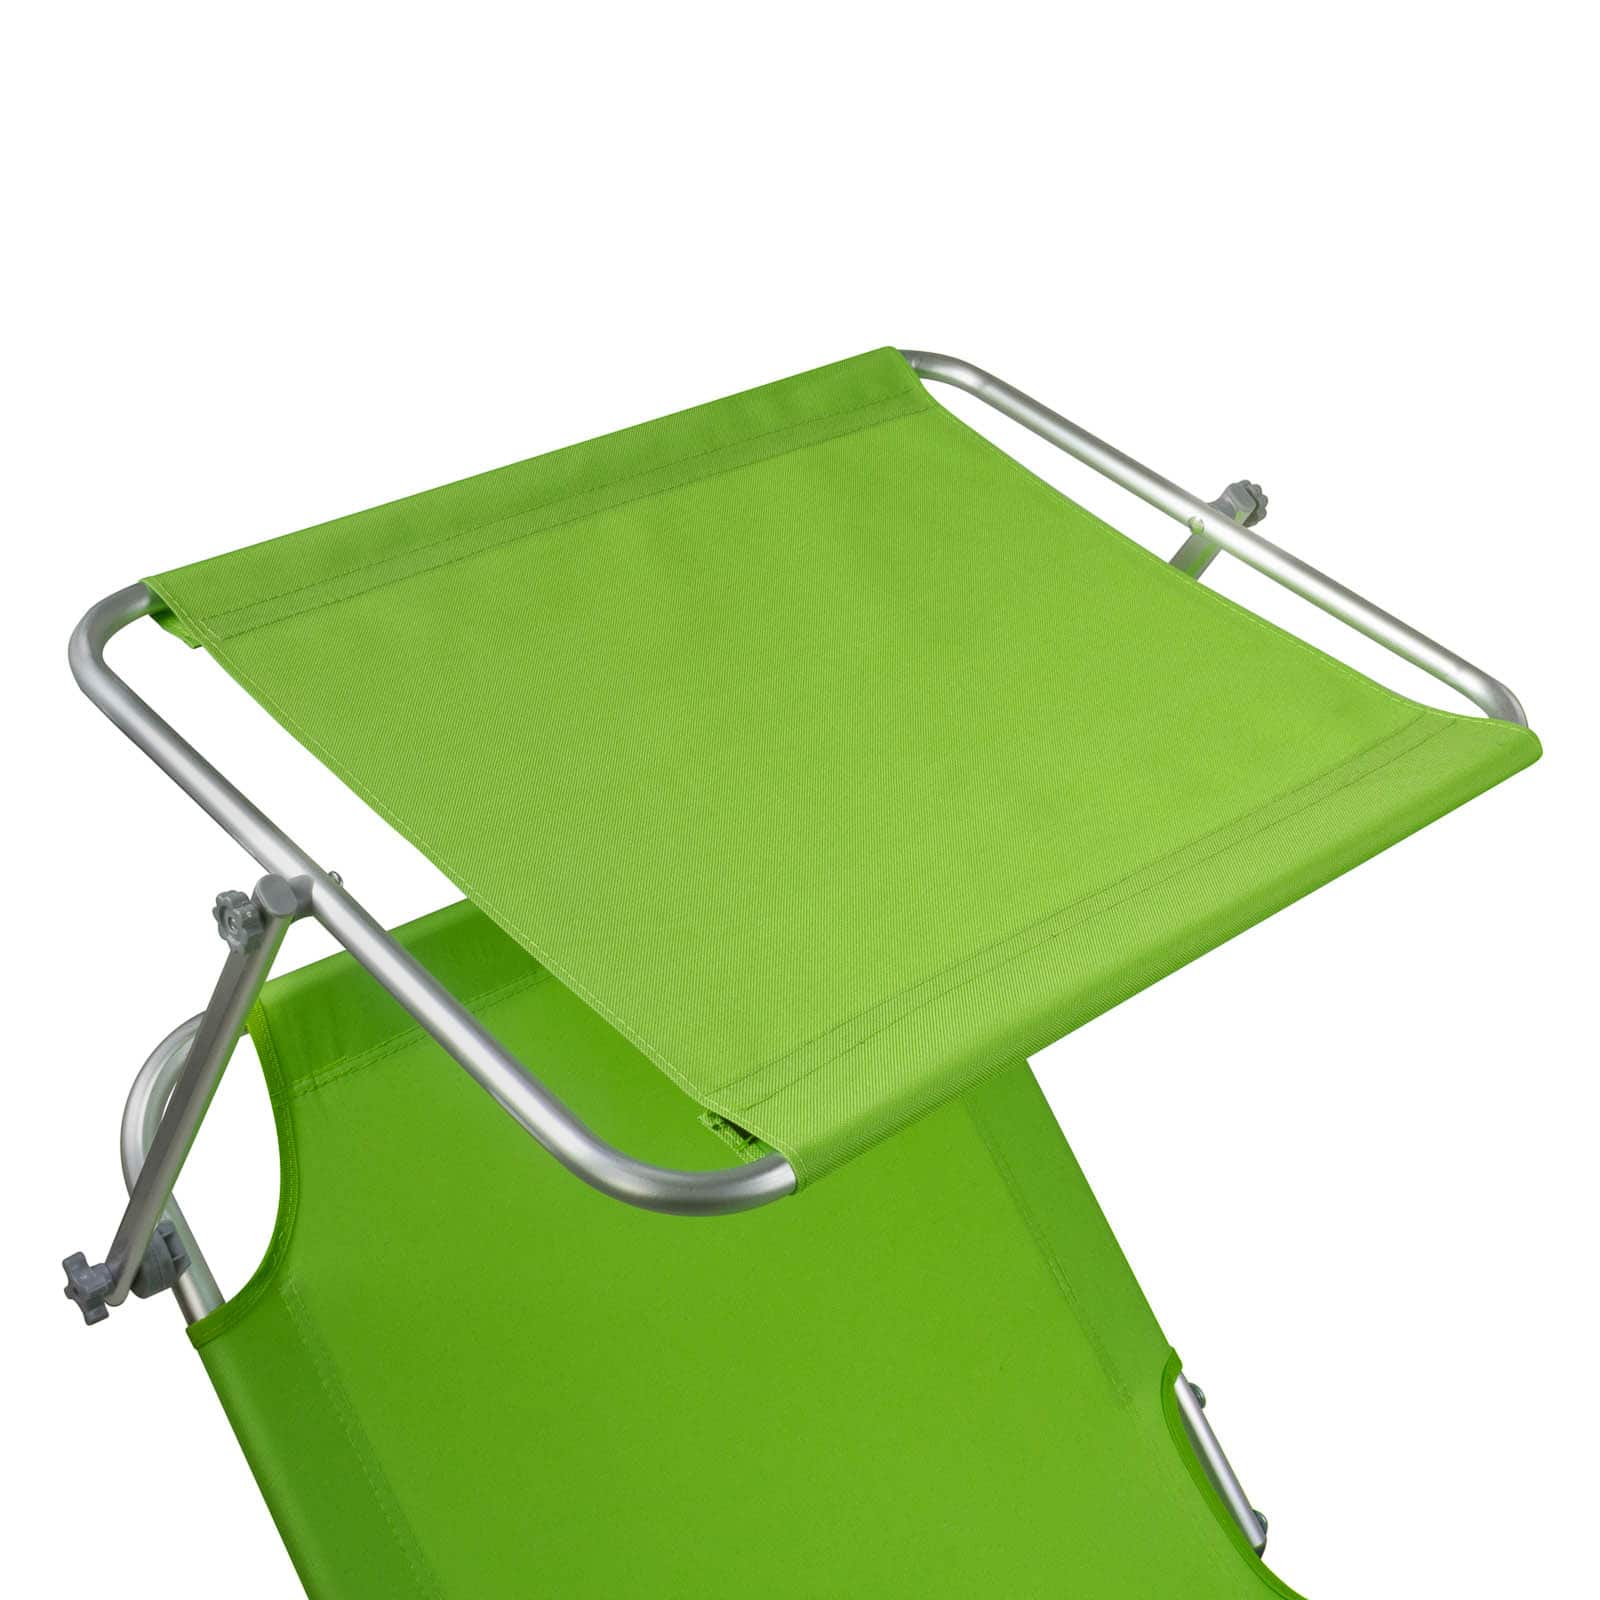 Comfortabel Aluminium Ligbed met Zonnendak 190x57 cm - Limegroen